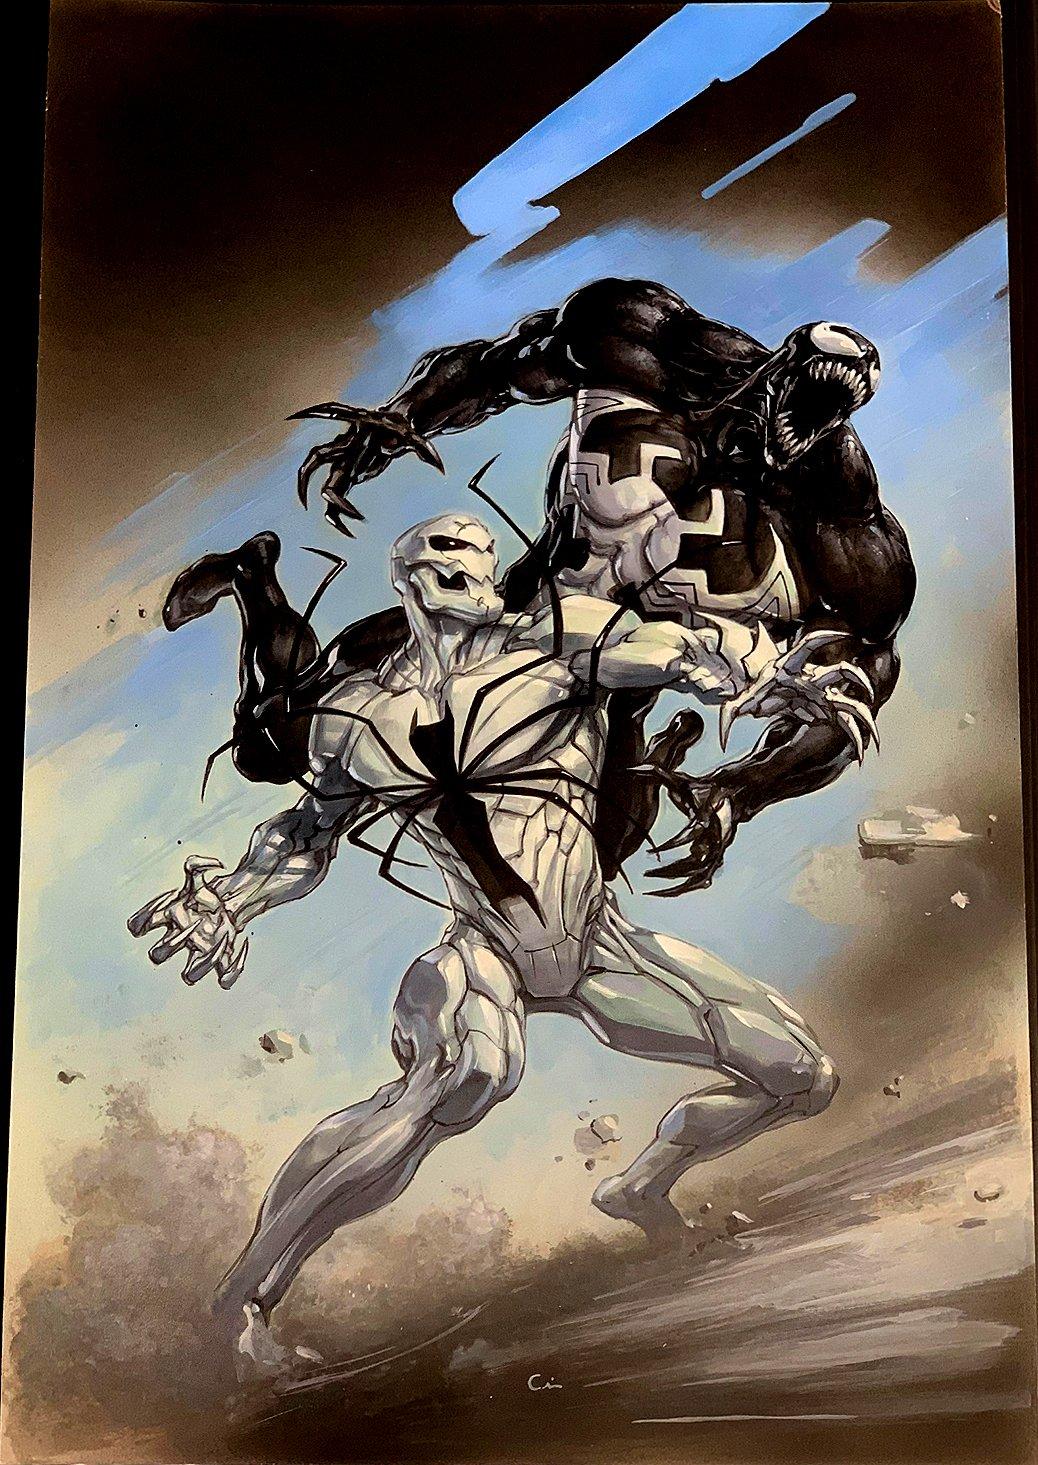 Venomverse #1 Large Cover Painting! (ASM #361 COVER HOMAGE! VENOM BATTLES POISON!) 2017